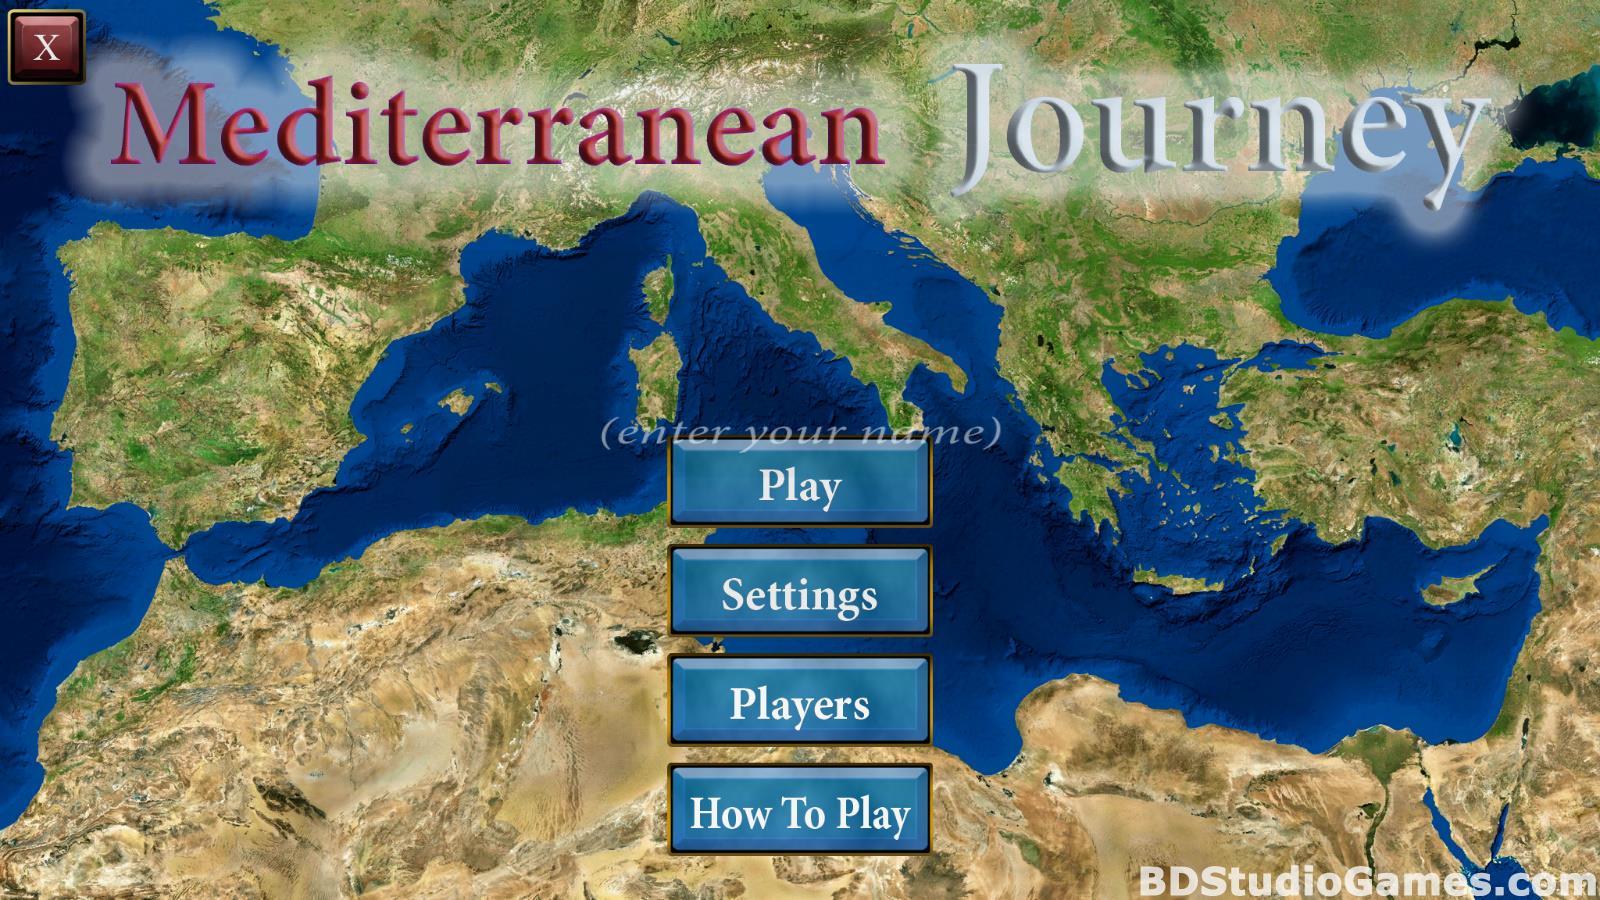 Mediterranean Journey Screenshots 01